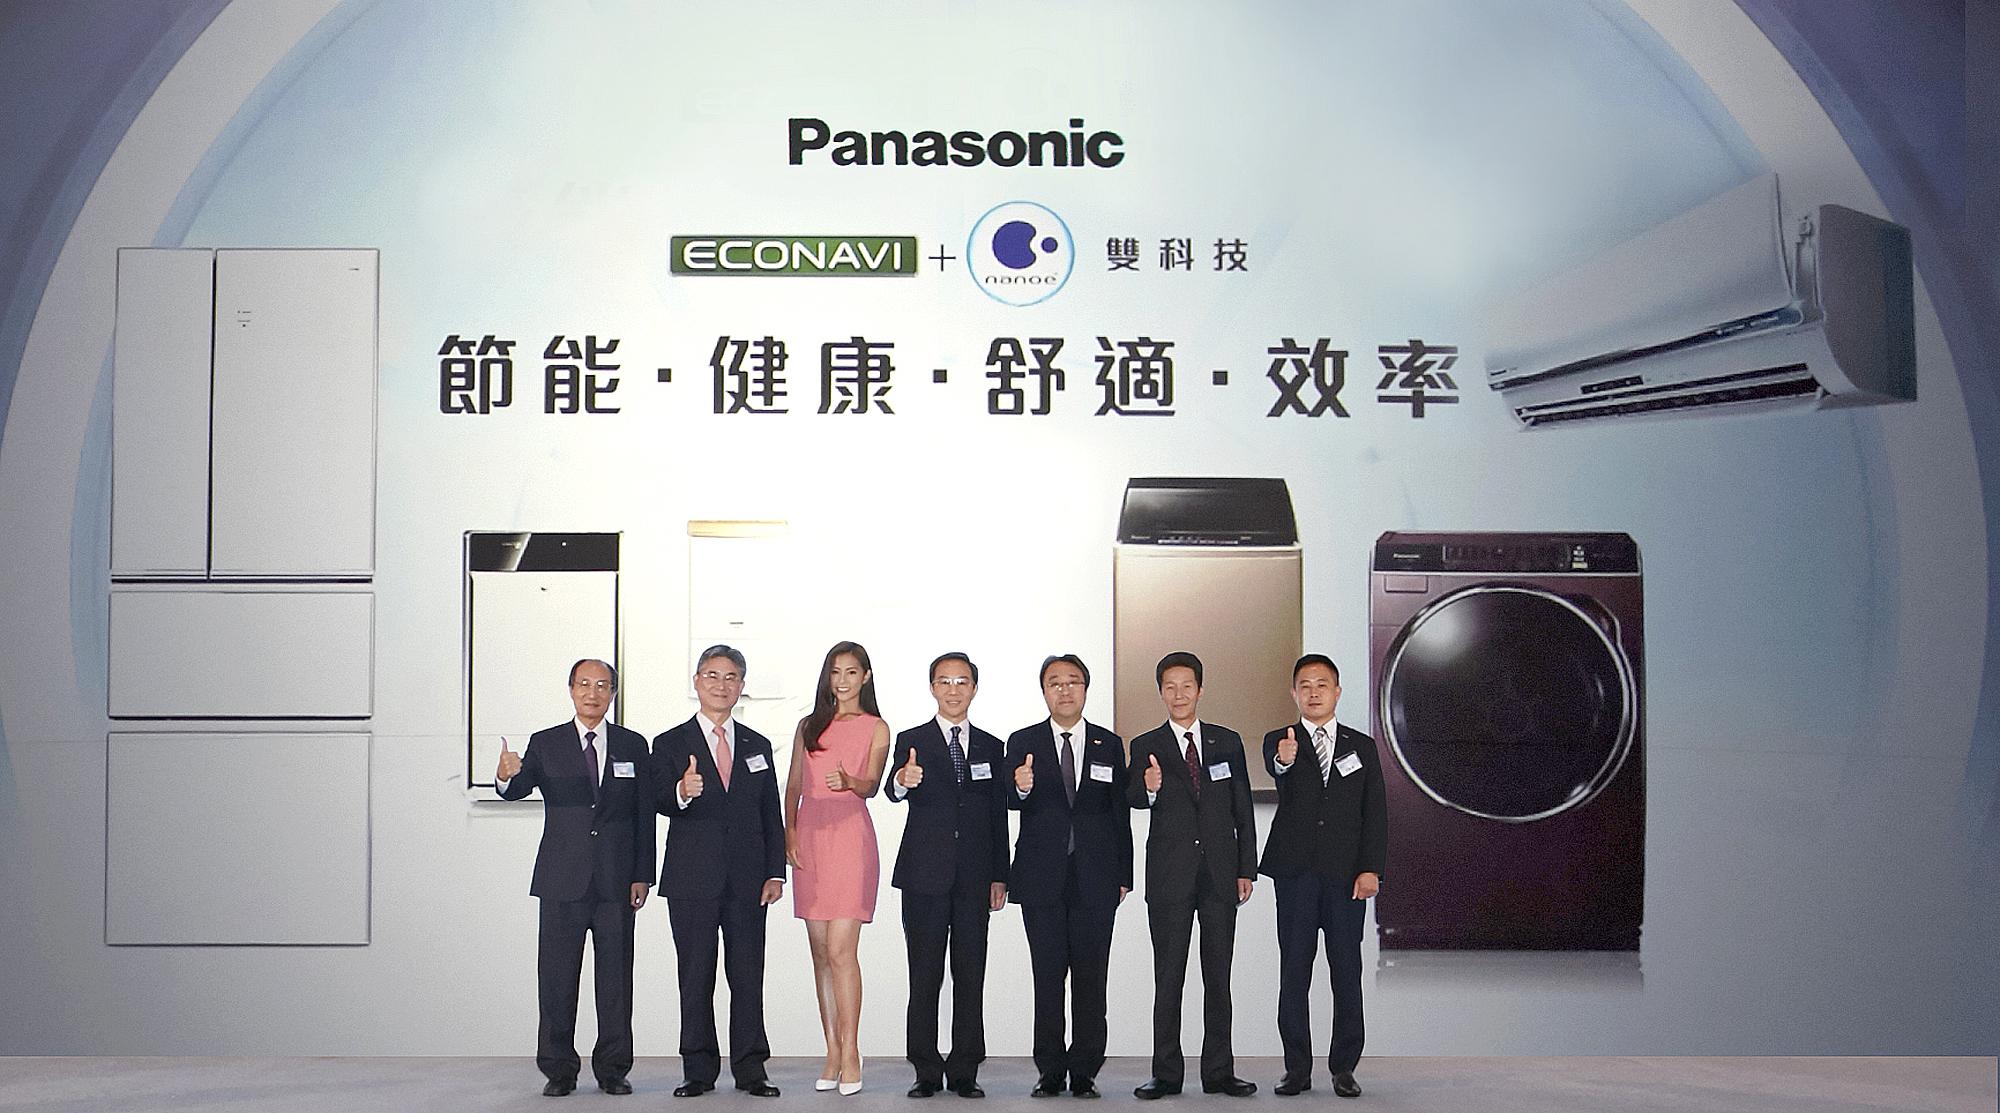 Panasonic 打造節能‧健康‧舒適‧效率的優質生活